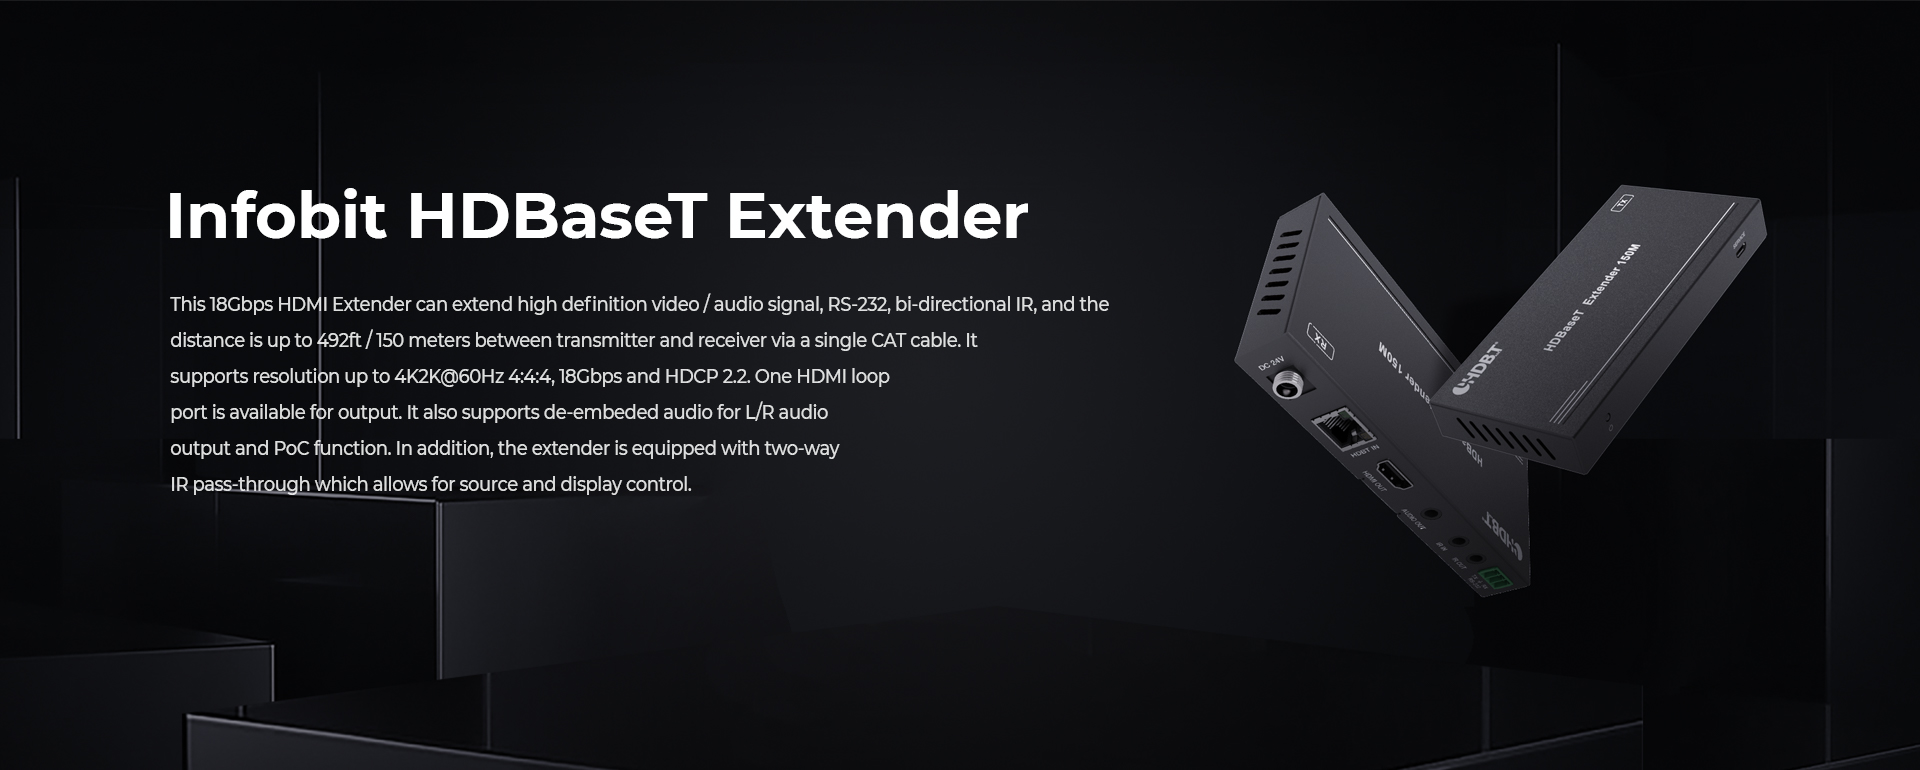 iTrans E150CG 18Gbps HDMI HDBaseT extenders